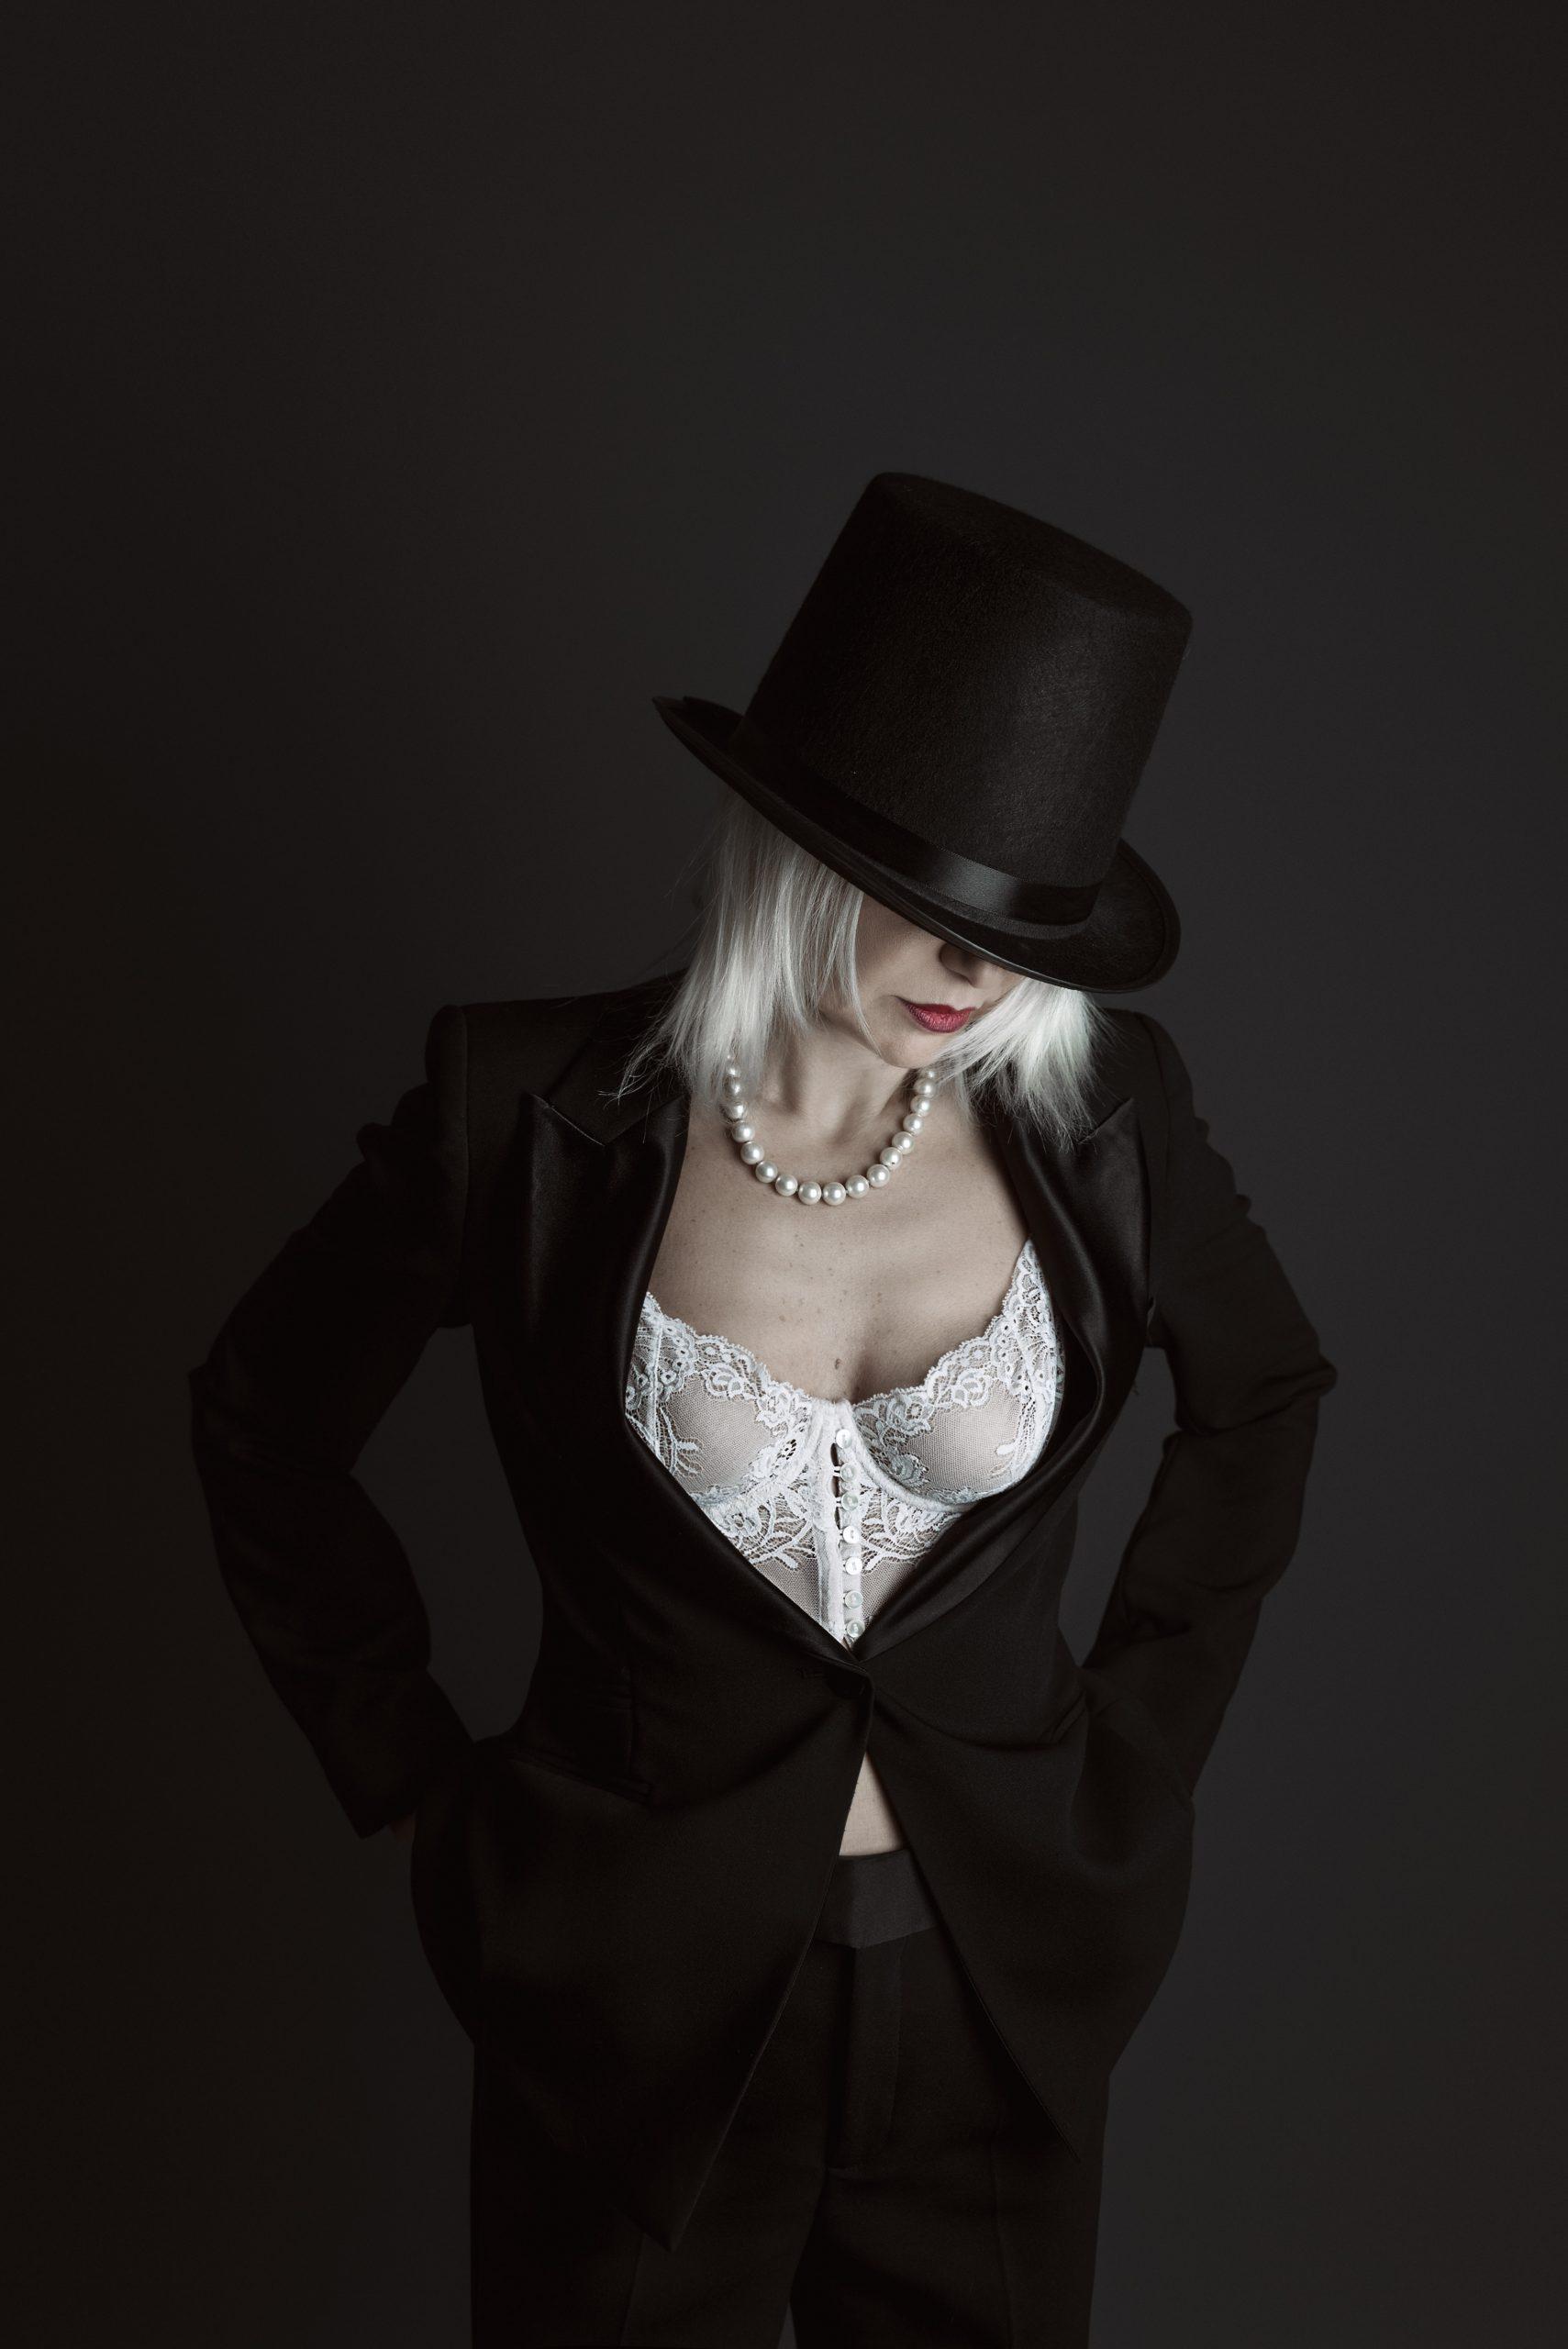 Lily Dupont mistress padrona prodomme femdom milano lombardia bdsm fetish feticismo sadomaso latex pvc giochi di ruolo role play worship